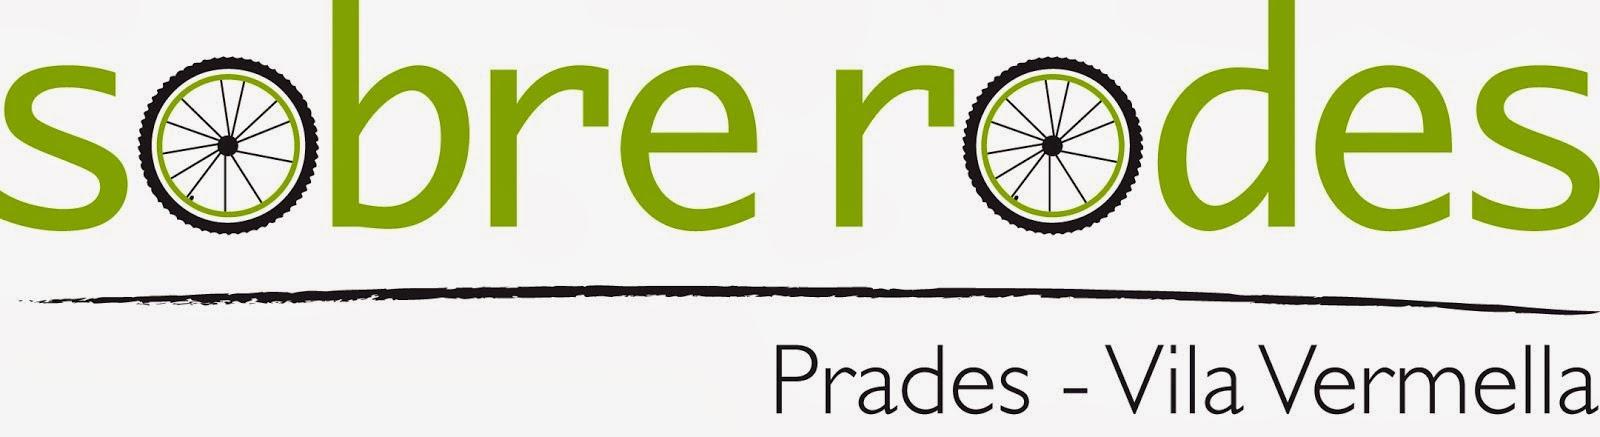 Lloguer de bicis a Prades